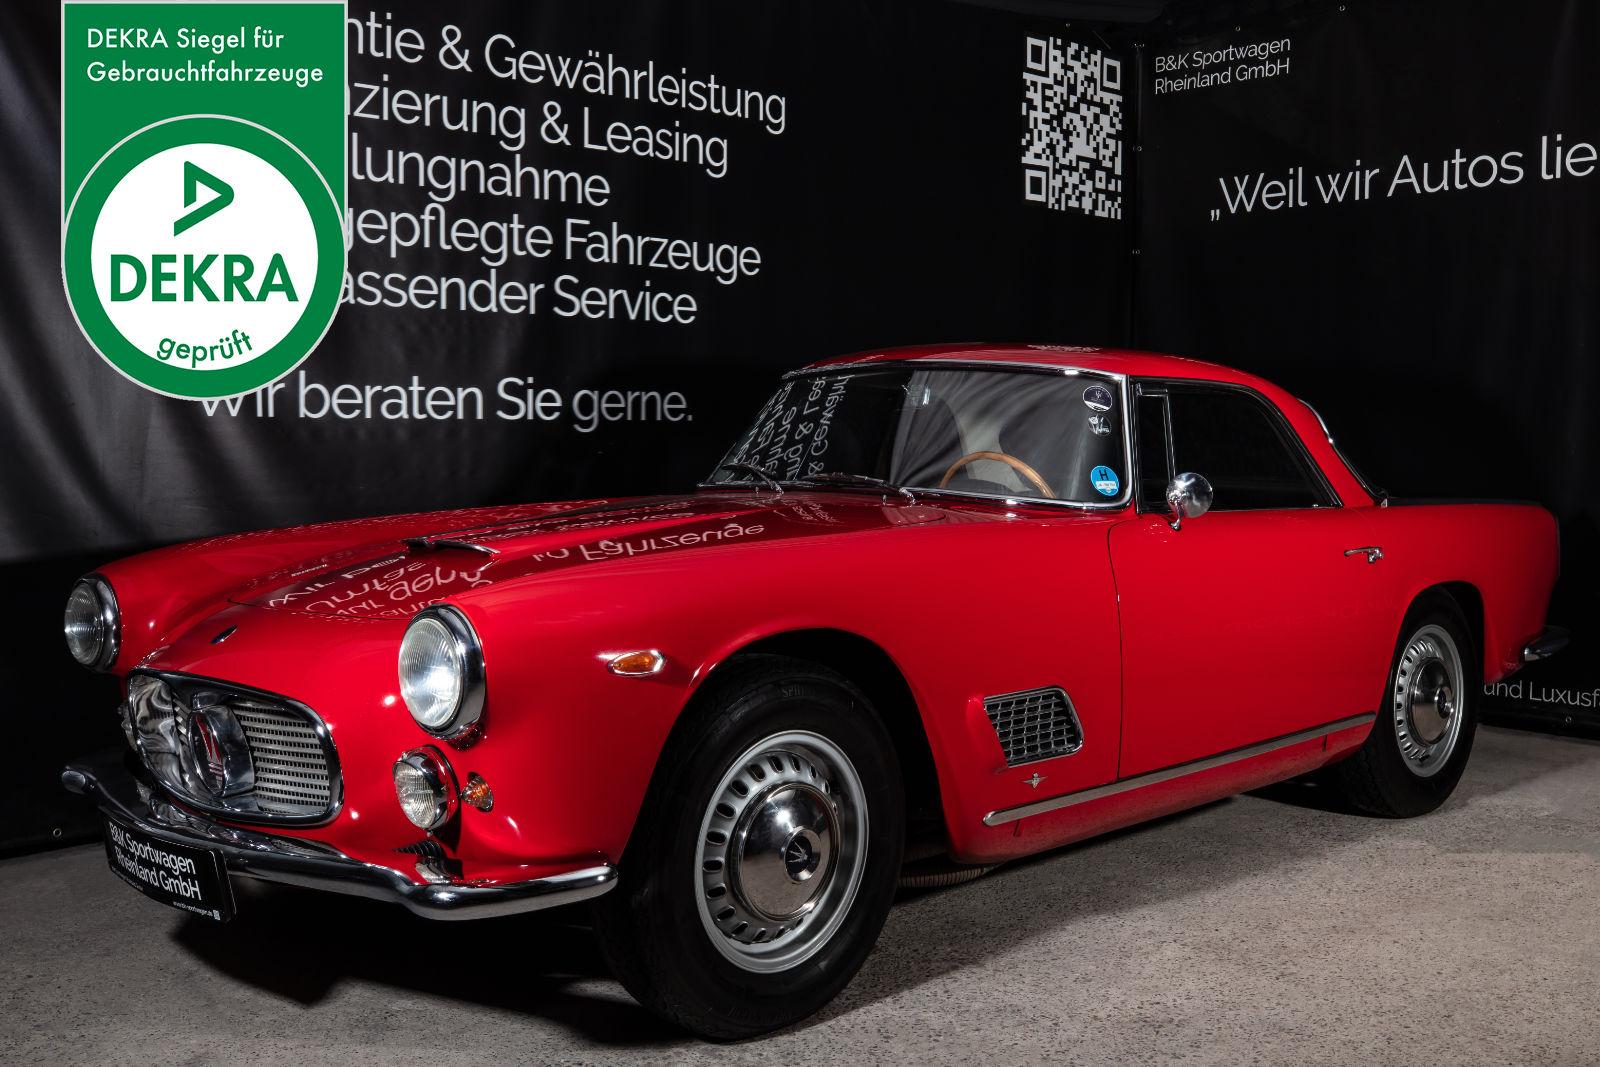 Maserati_3500_GT_Rot_Schwarz_MAS-1742_Plakette_w